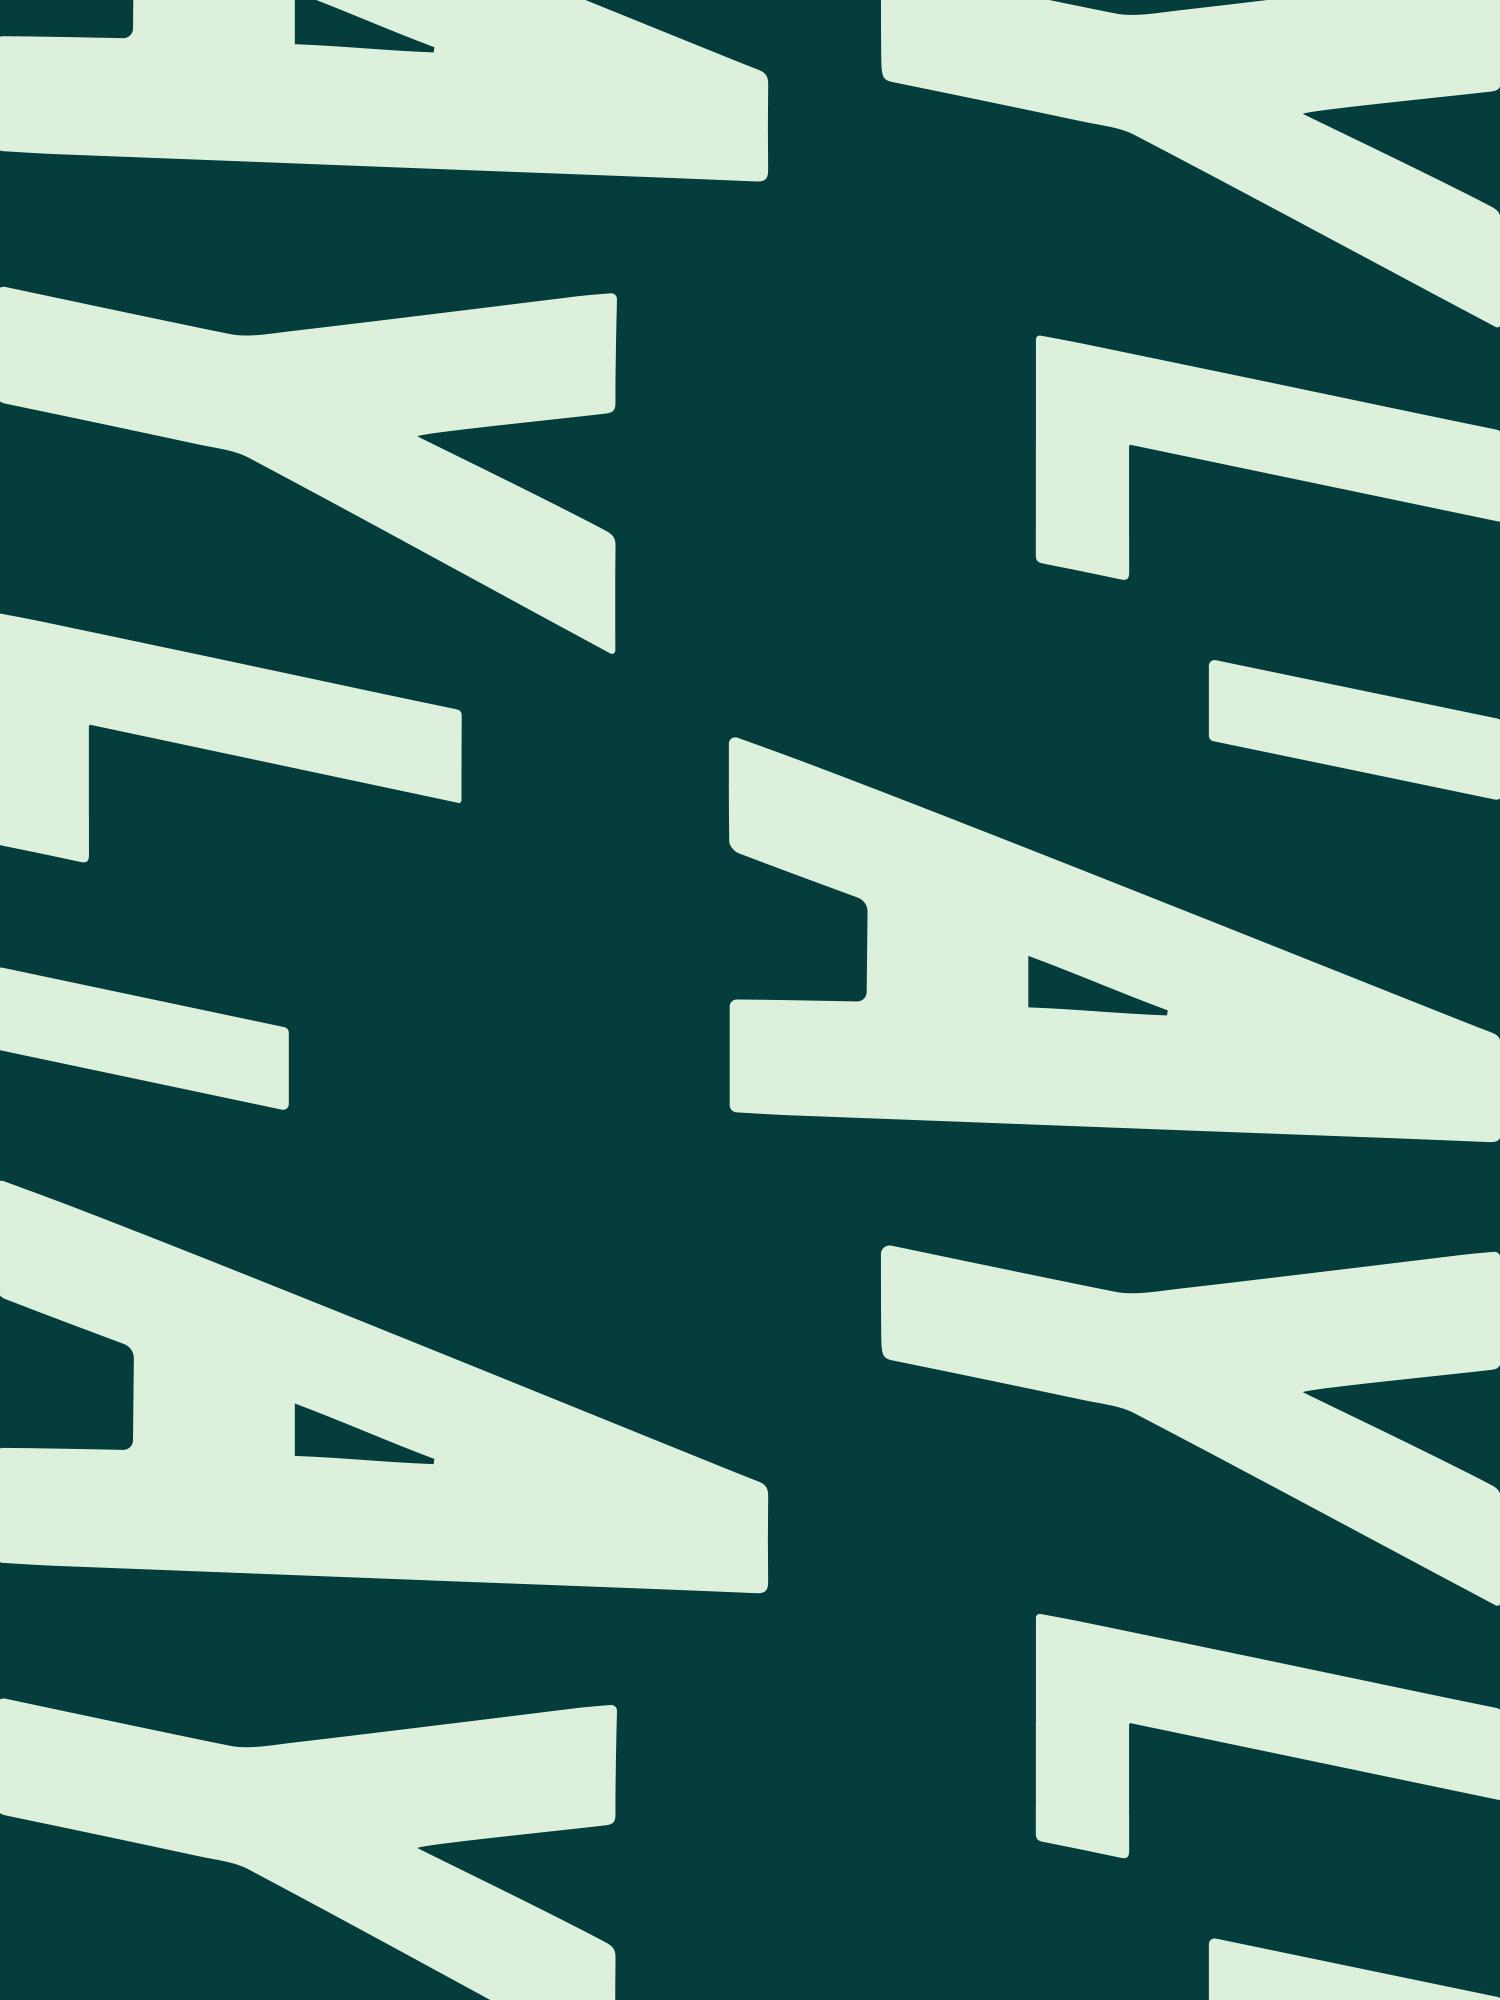 Ayli_Logo-Versions_pattern